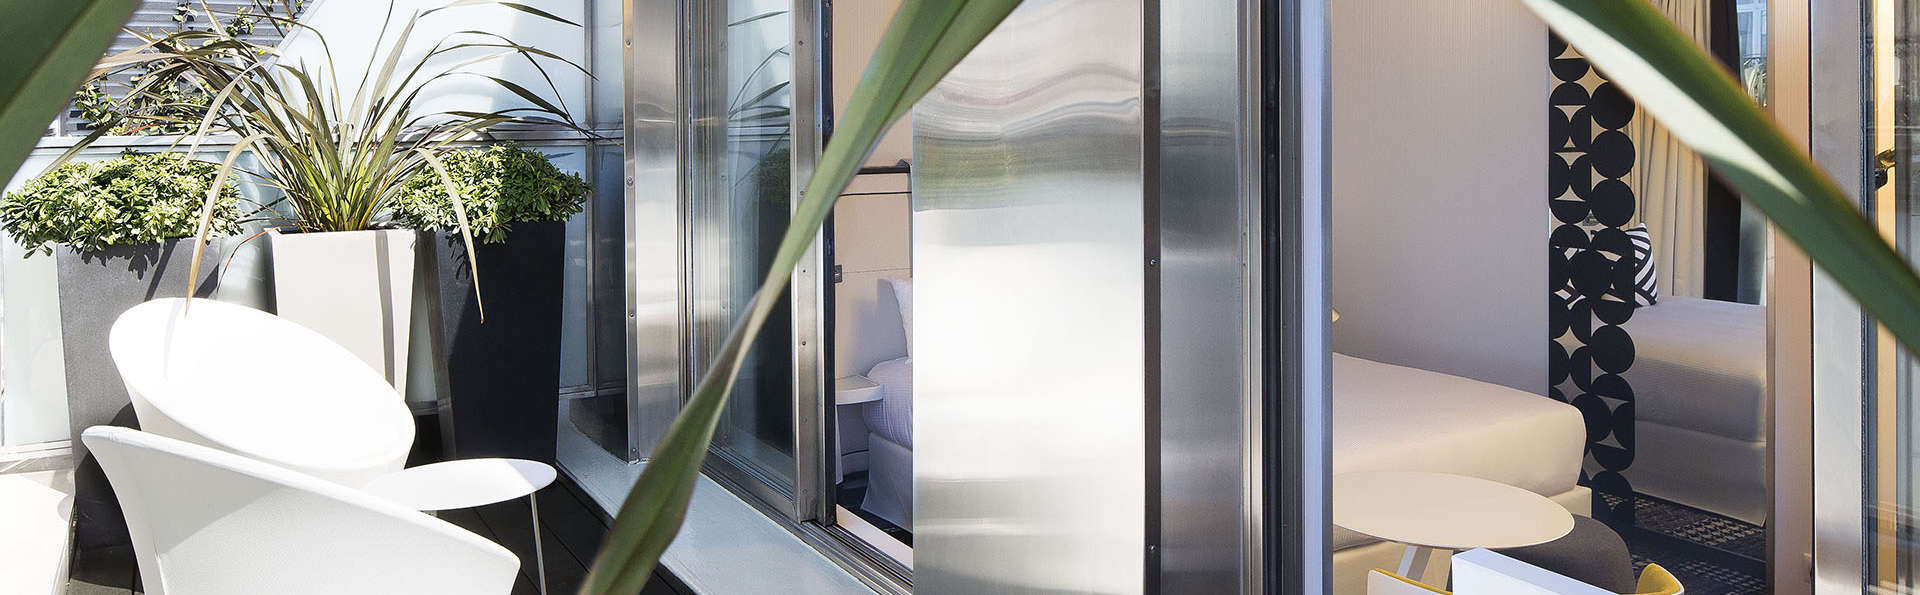 Hôtel Ekta - EDIT_elegance_terrasse__4_.jpg